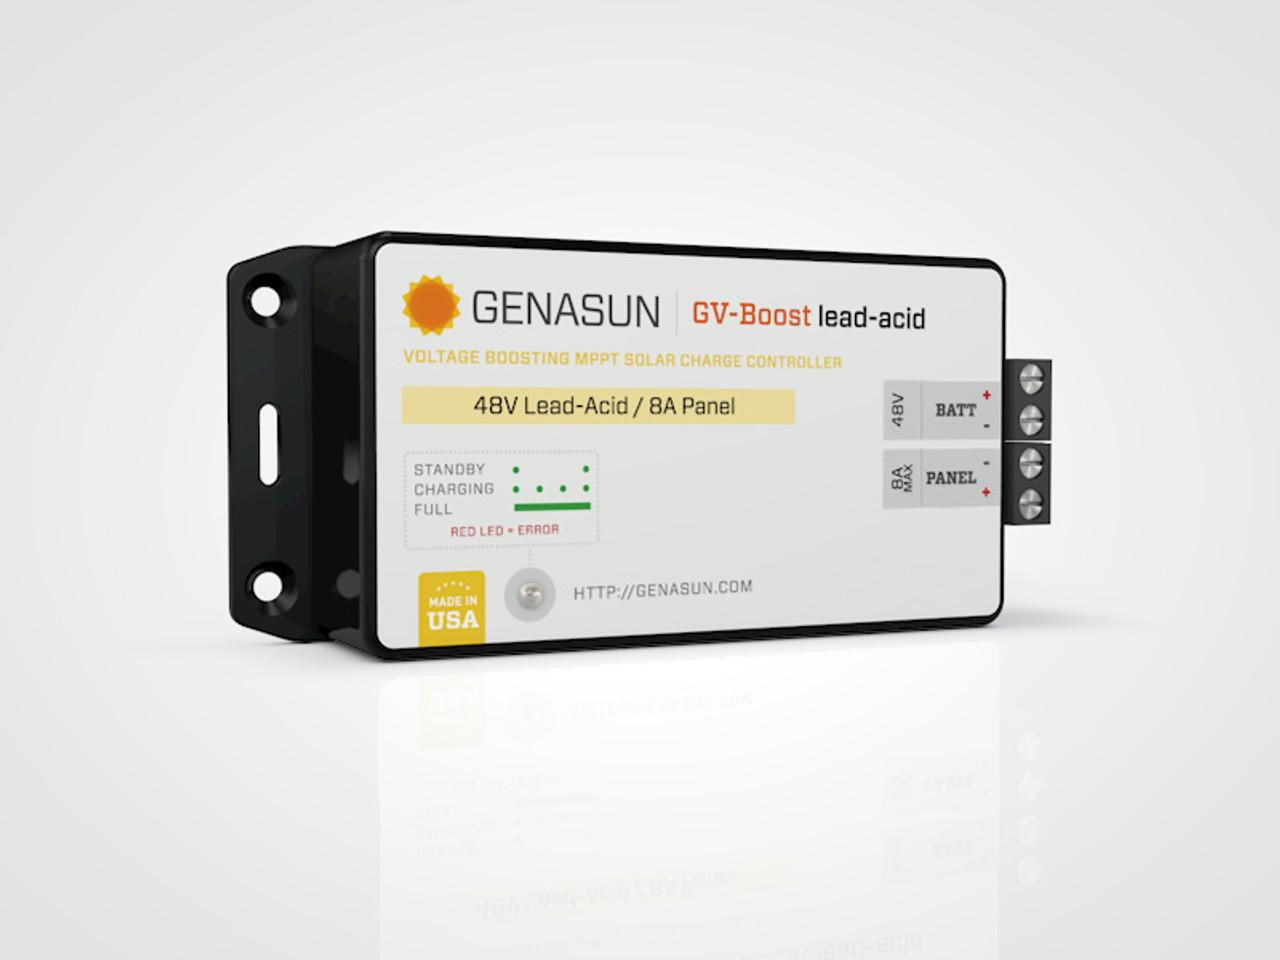 GVB-8 | 210W 8A 24V Genasun MPPT Boost Solar Charge Controller - Pb - Left1